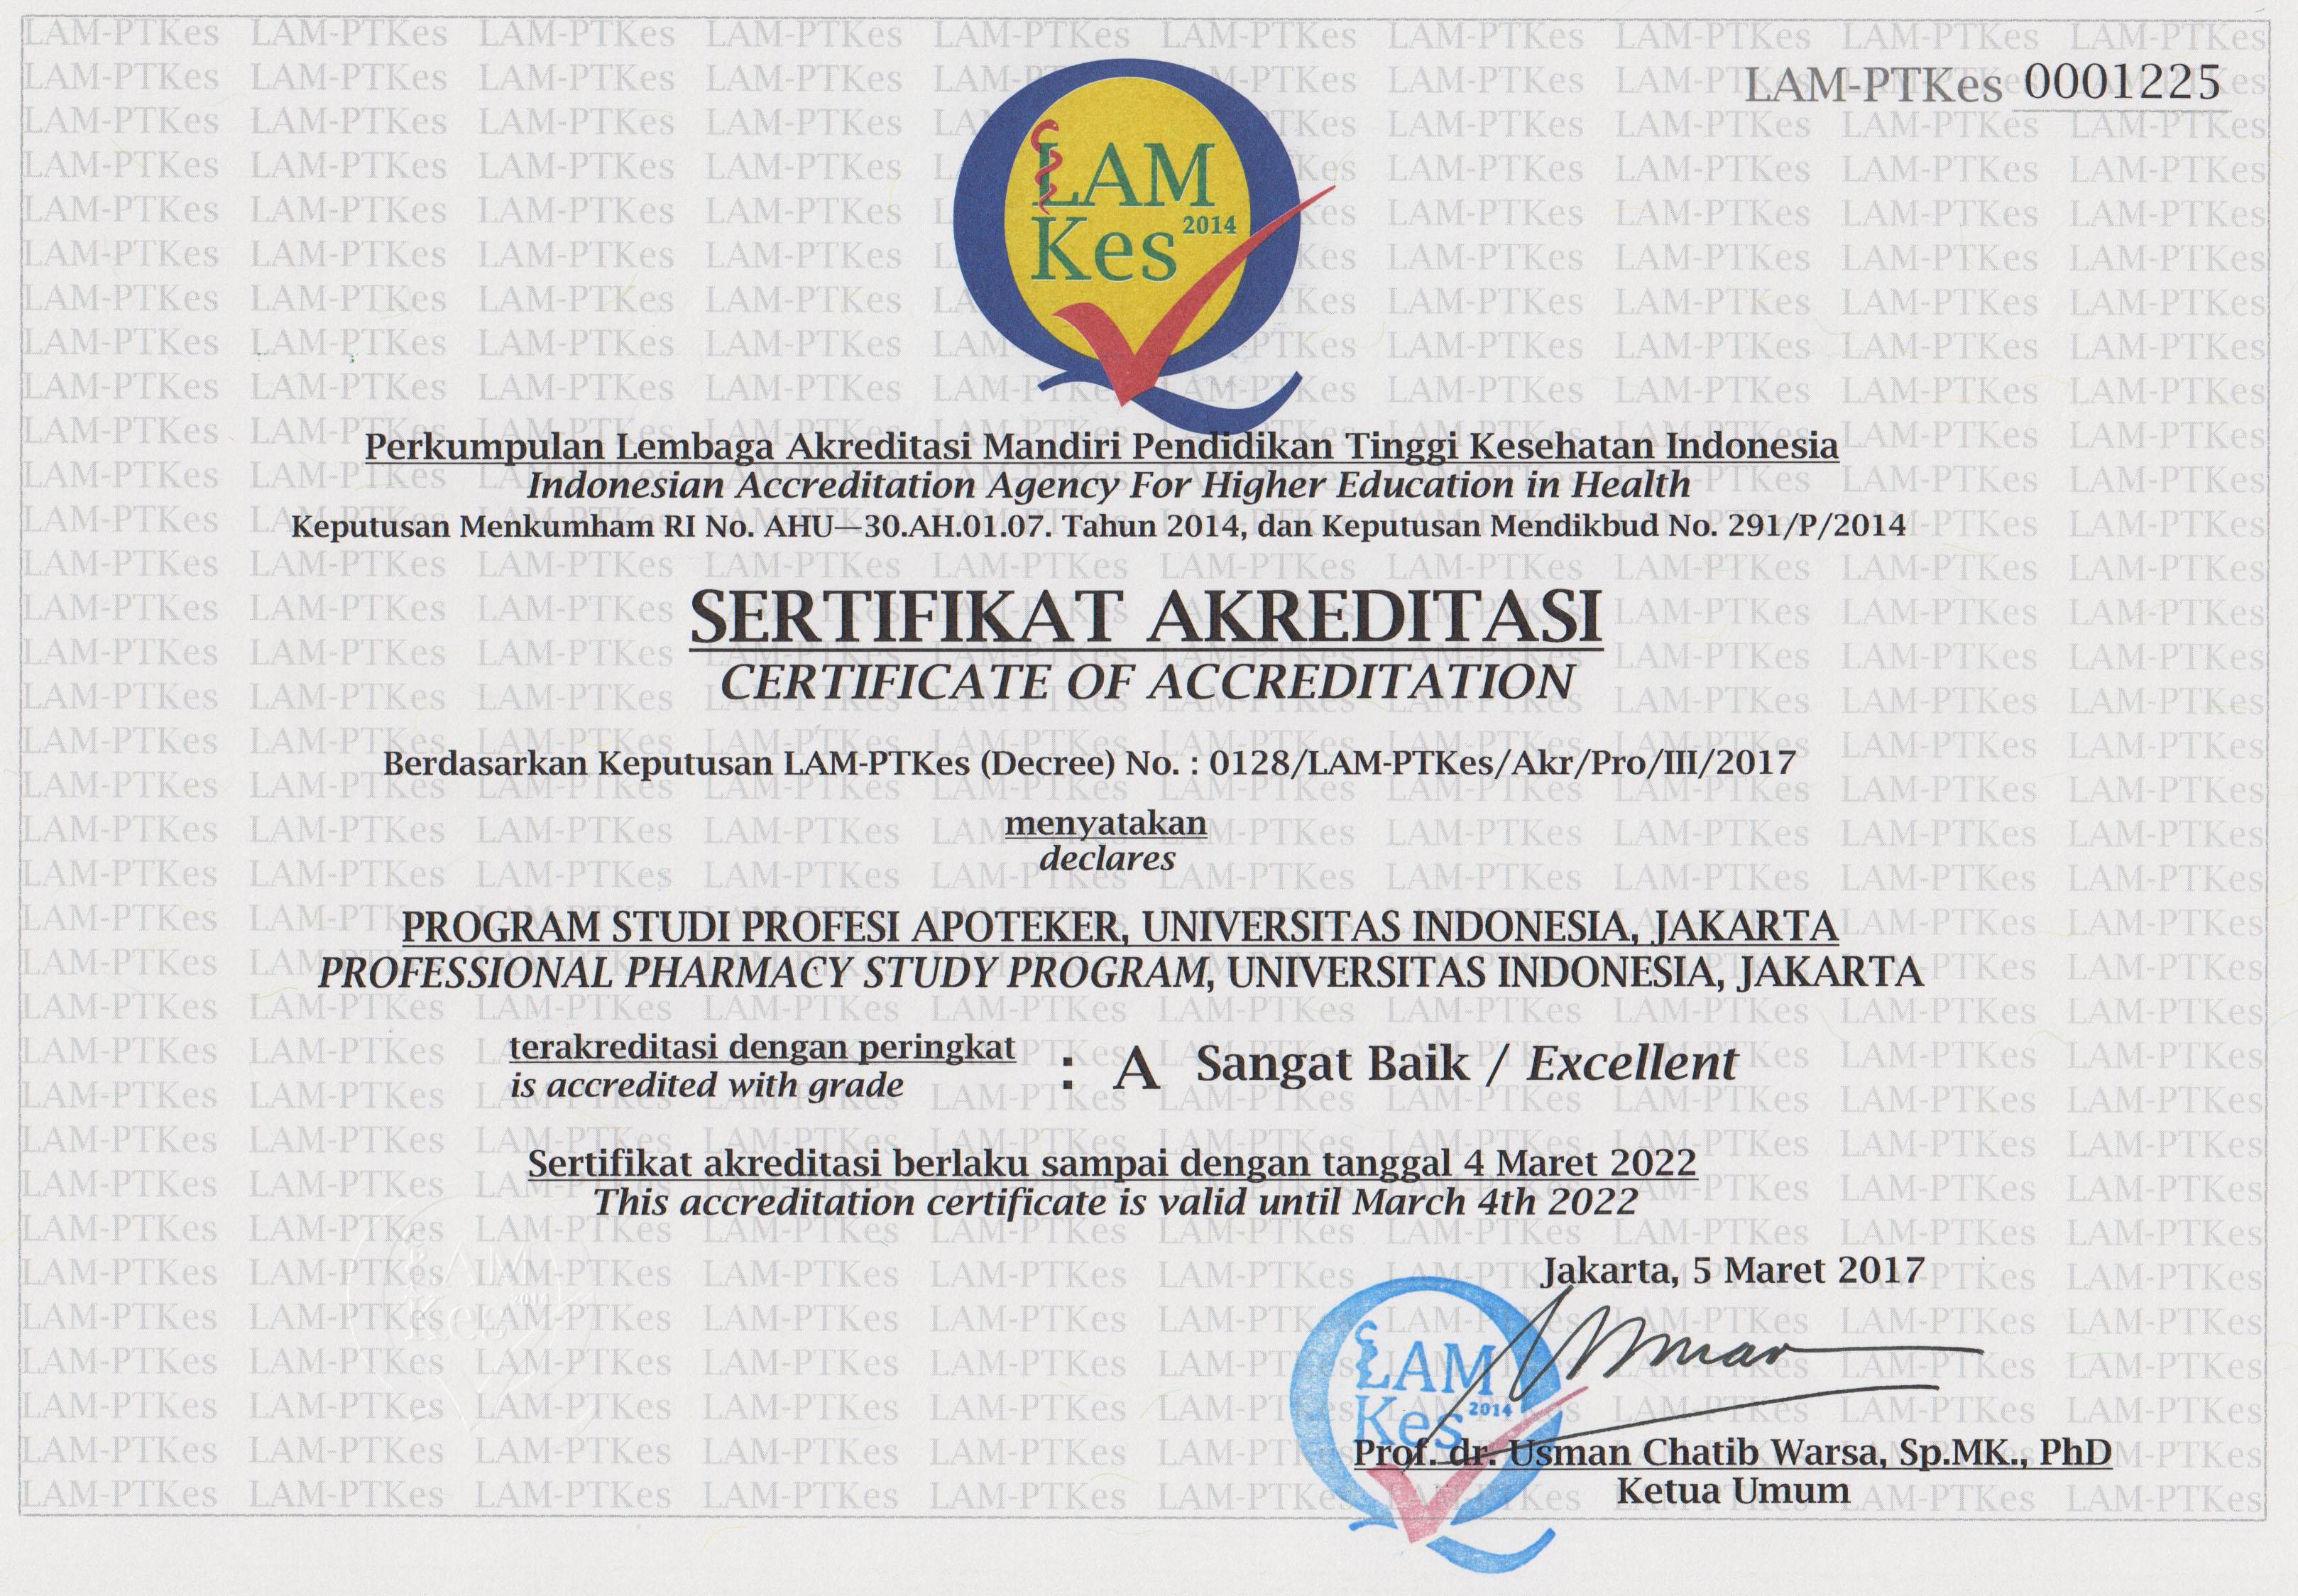 Akreditasi Apoteker 2017